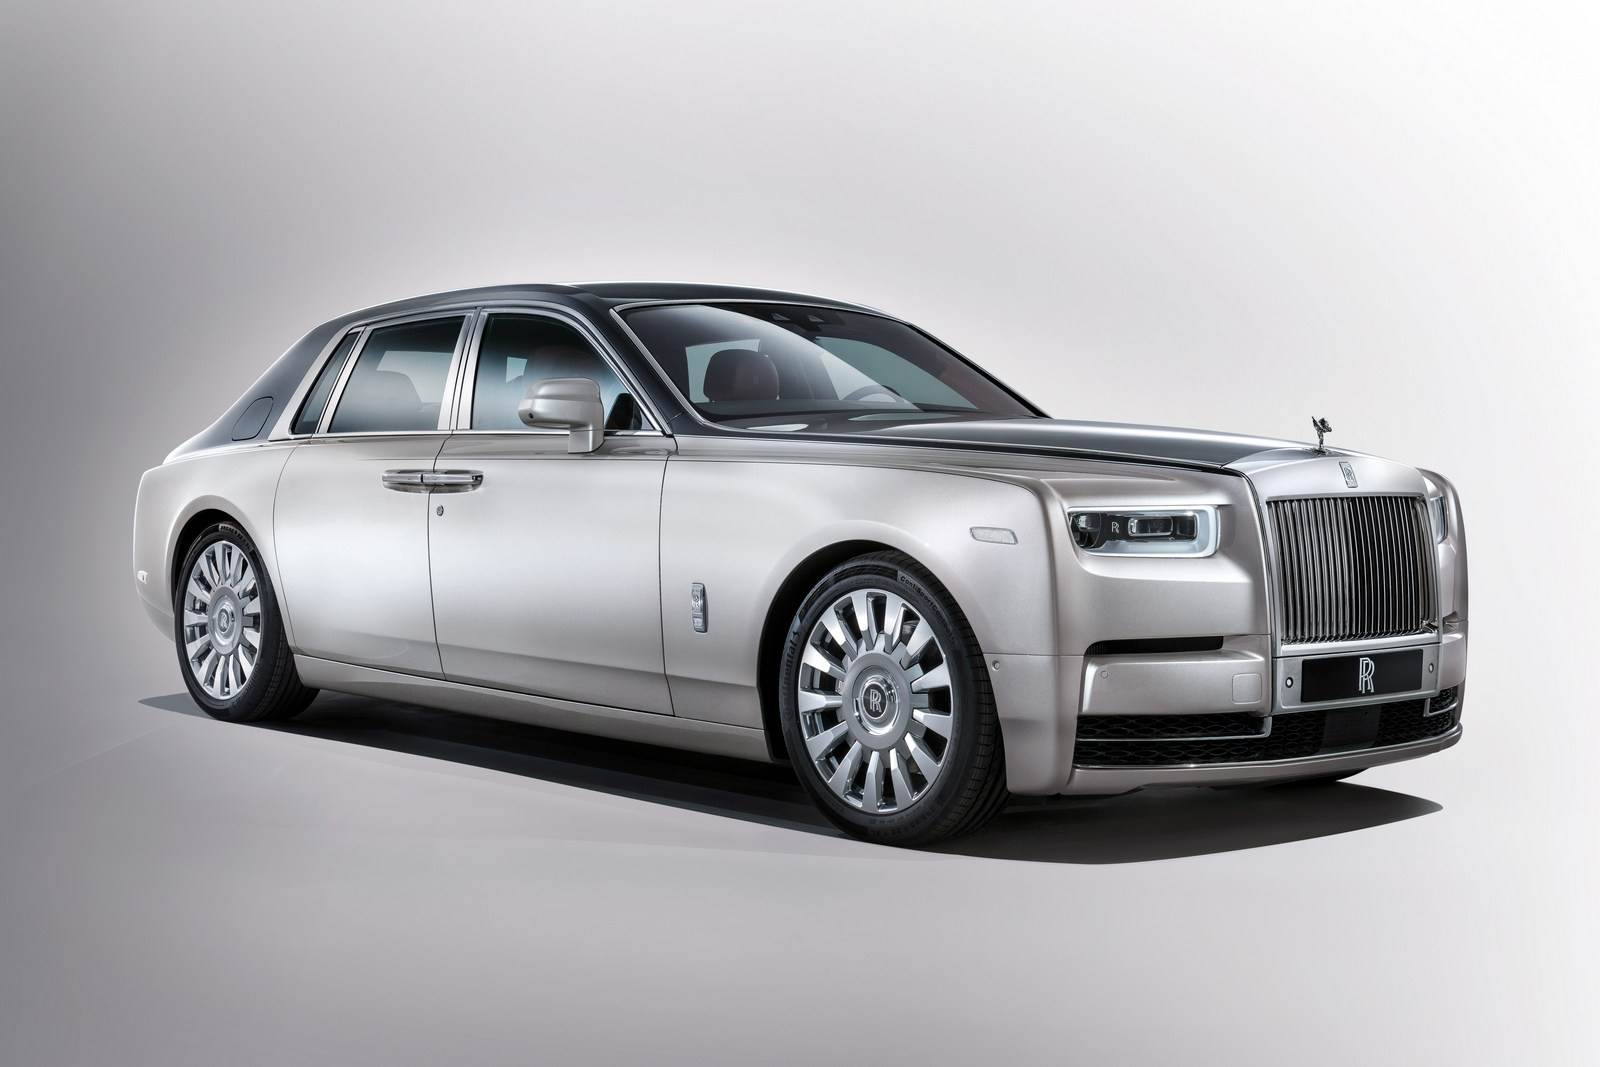 2018 Rolls-Royce Phantom image gallery